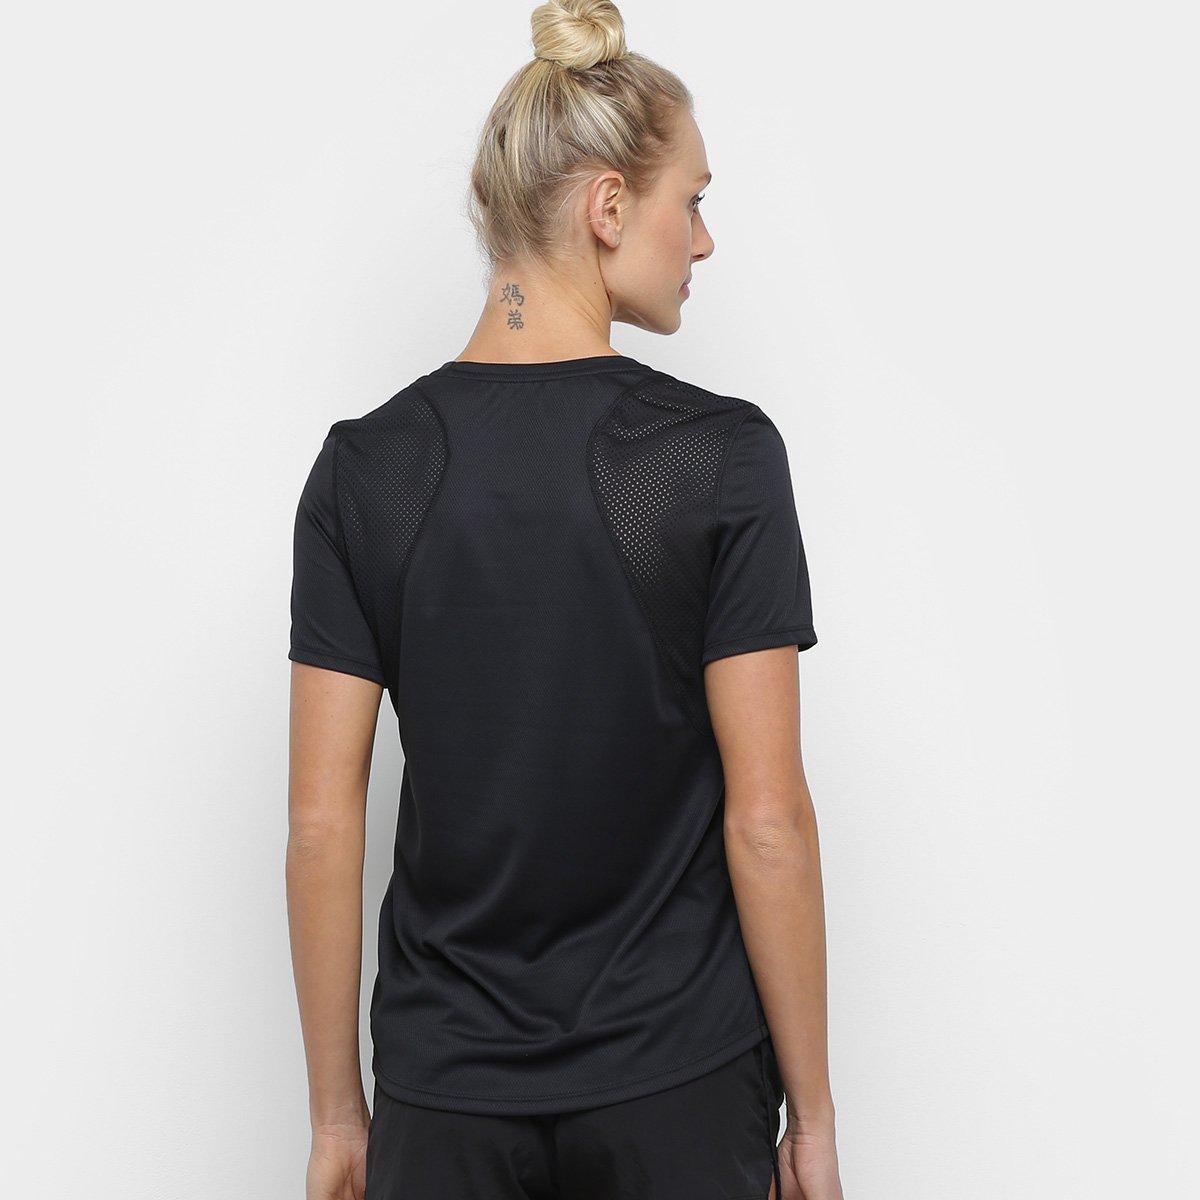 Camiseta Nike DRI-FIT Run Feminina - Tam: G - 1